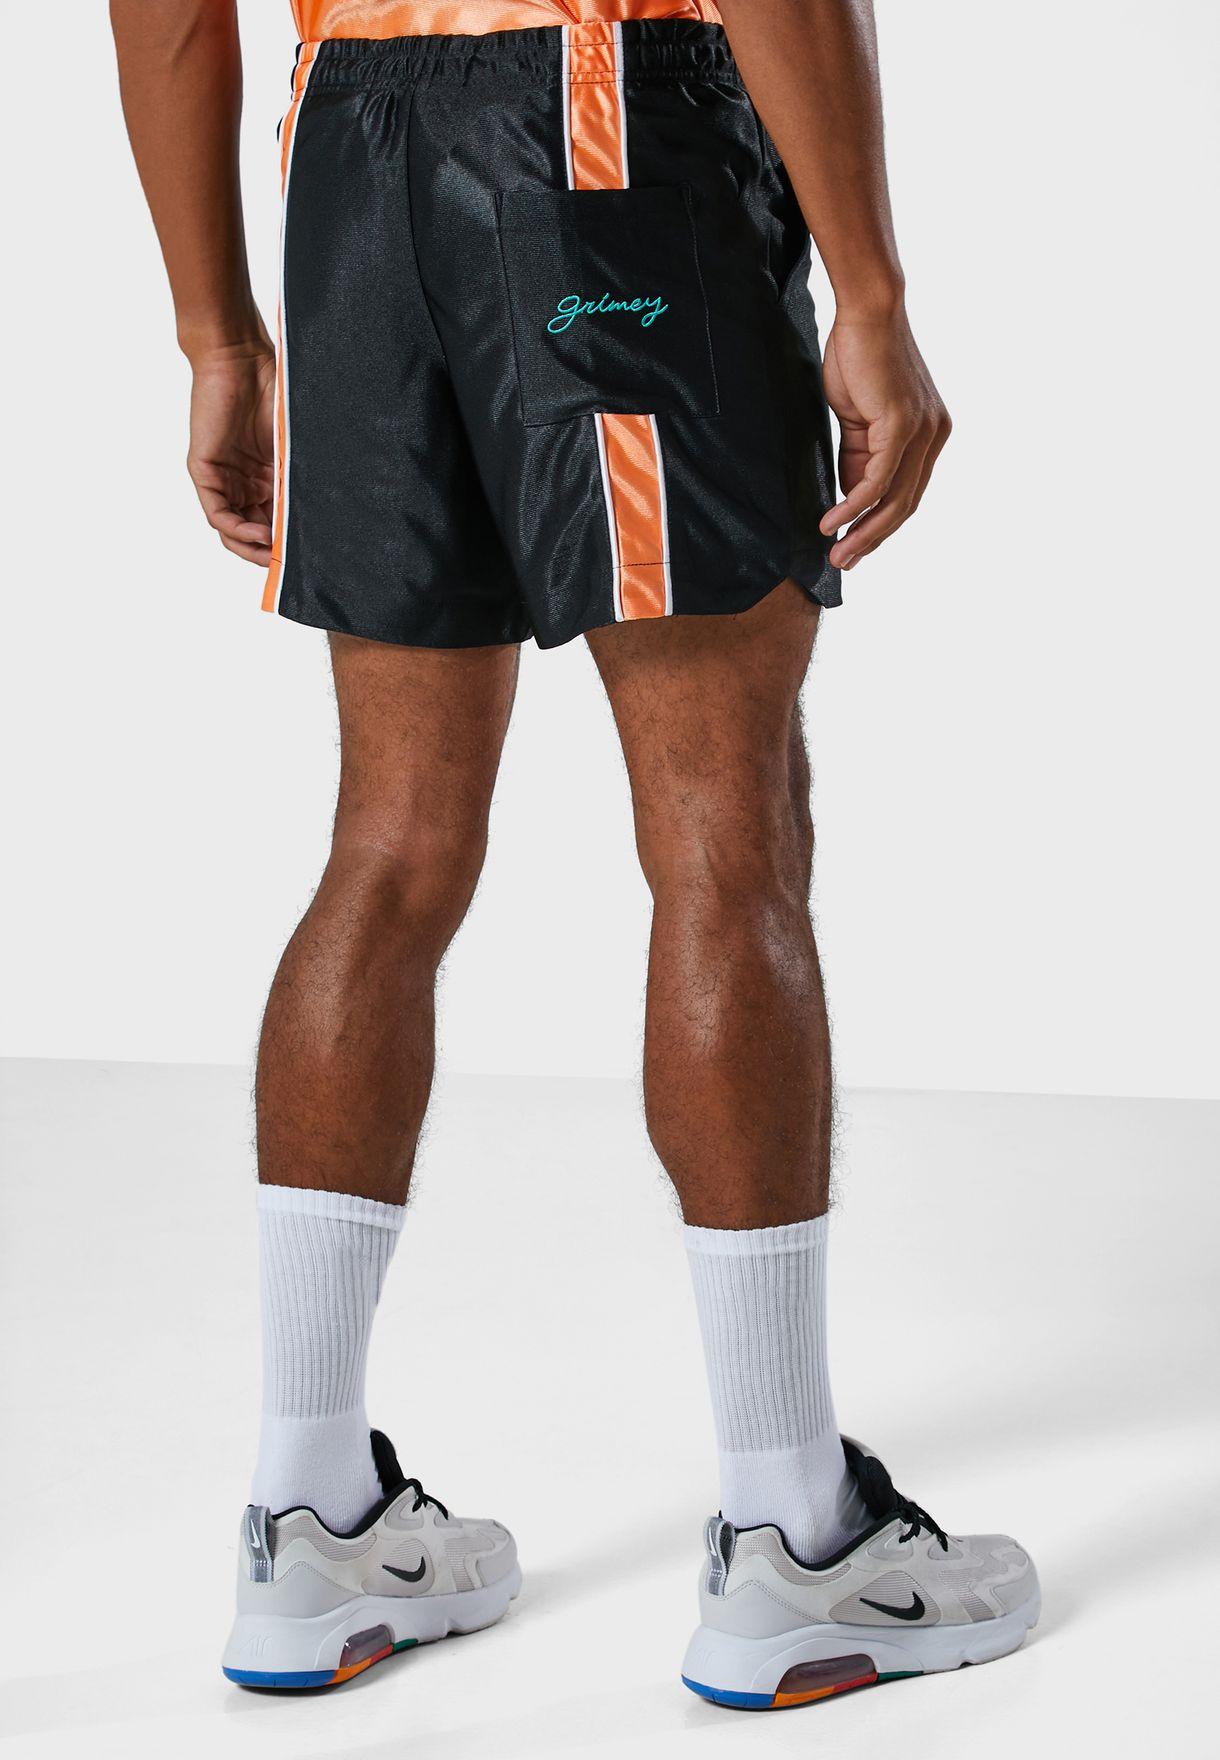 Acknowledge Shorts